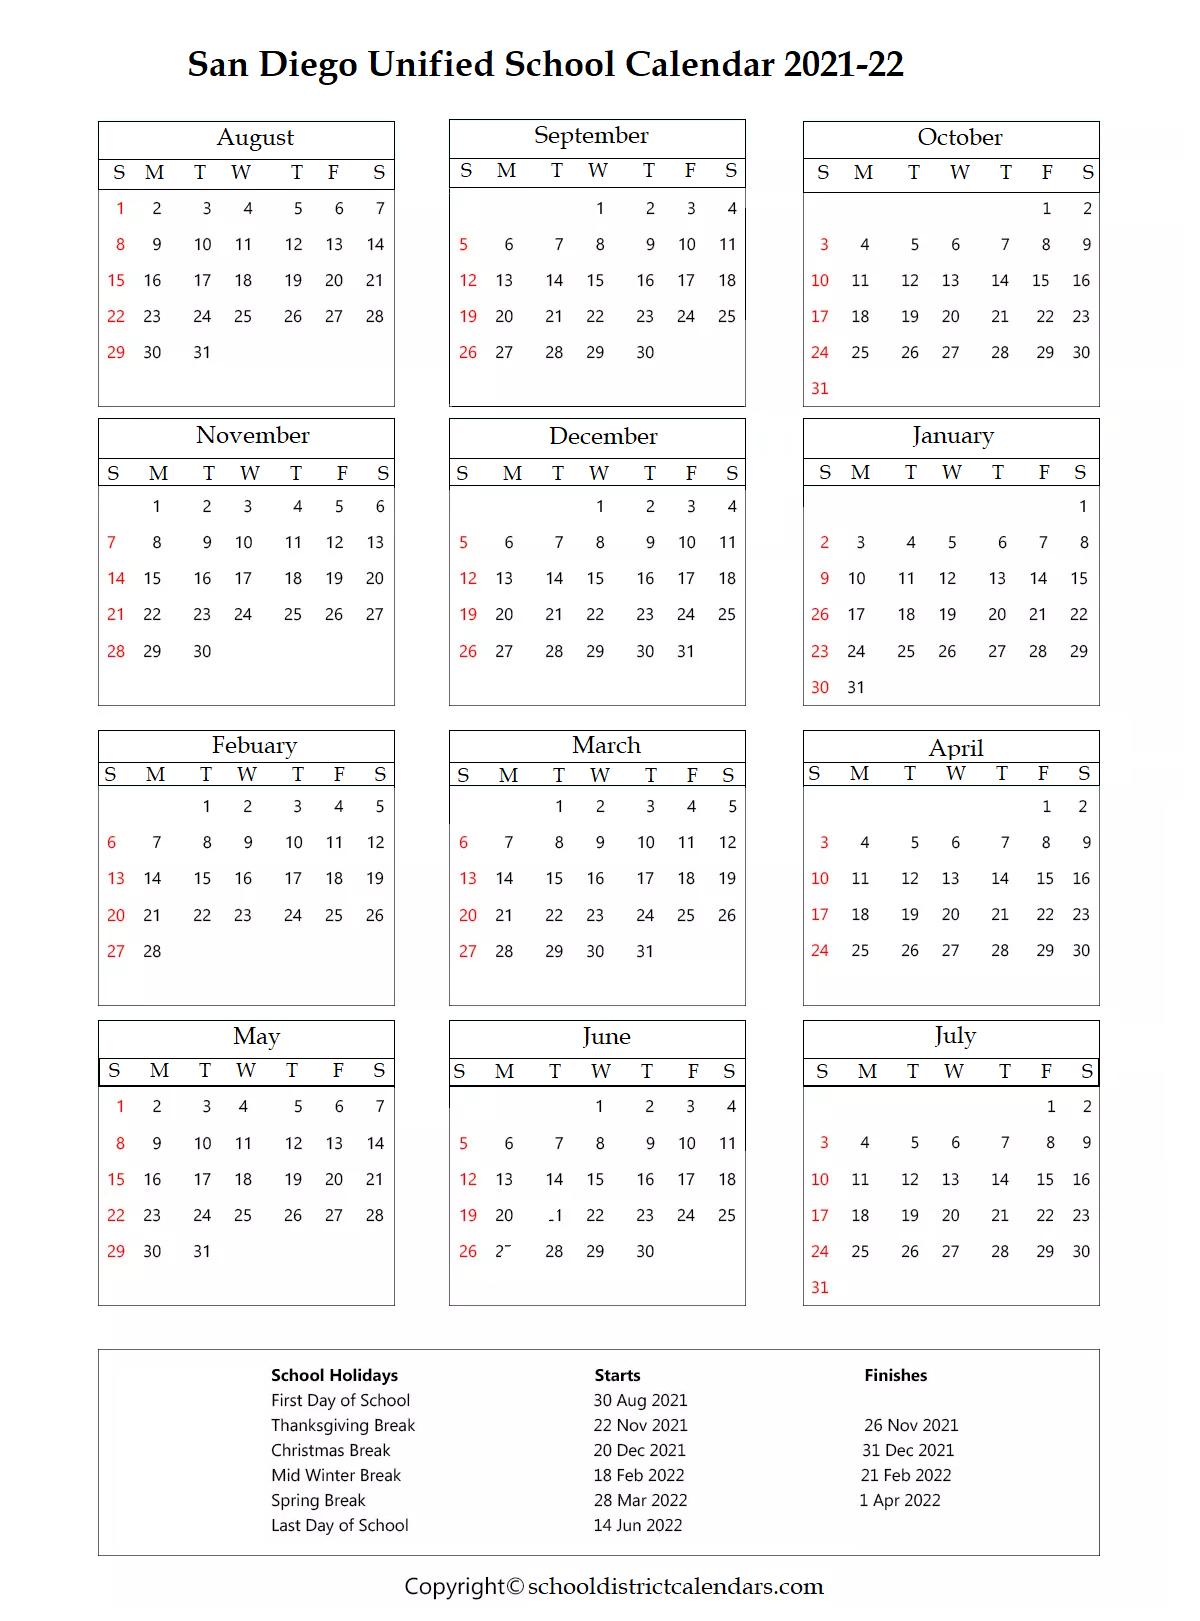 San Diego Unified School District Calendar 2021